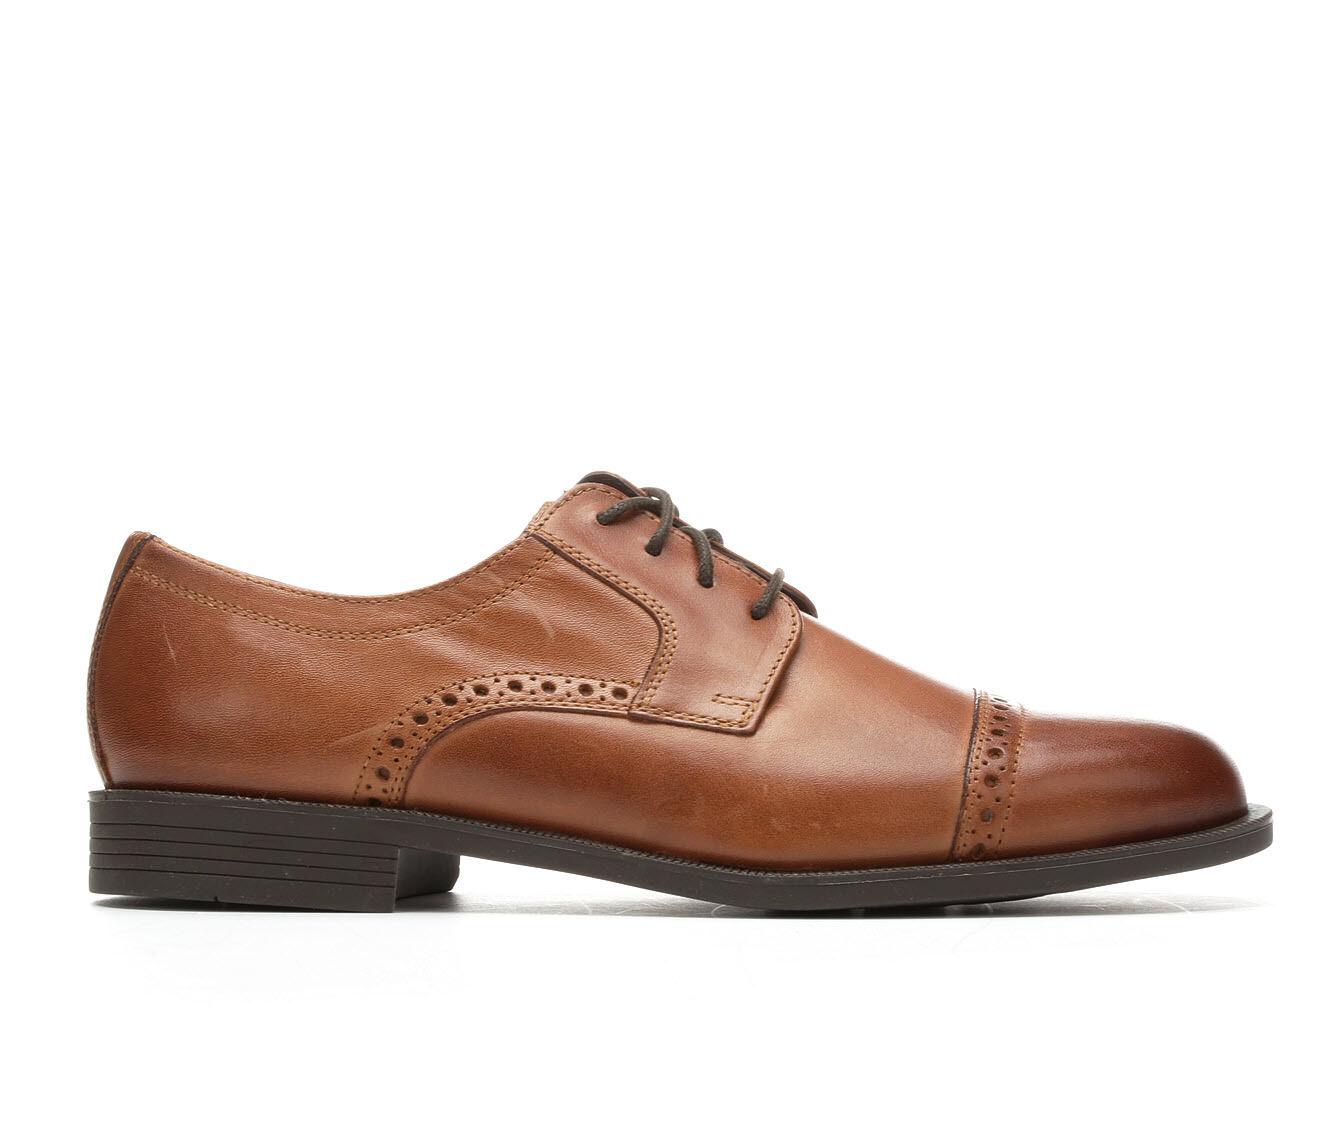 Men's Cole Haan Dustin Brougue II Dress Shoes British Tan